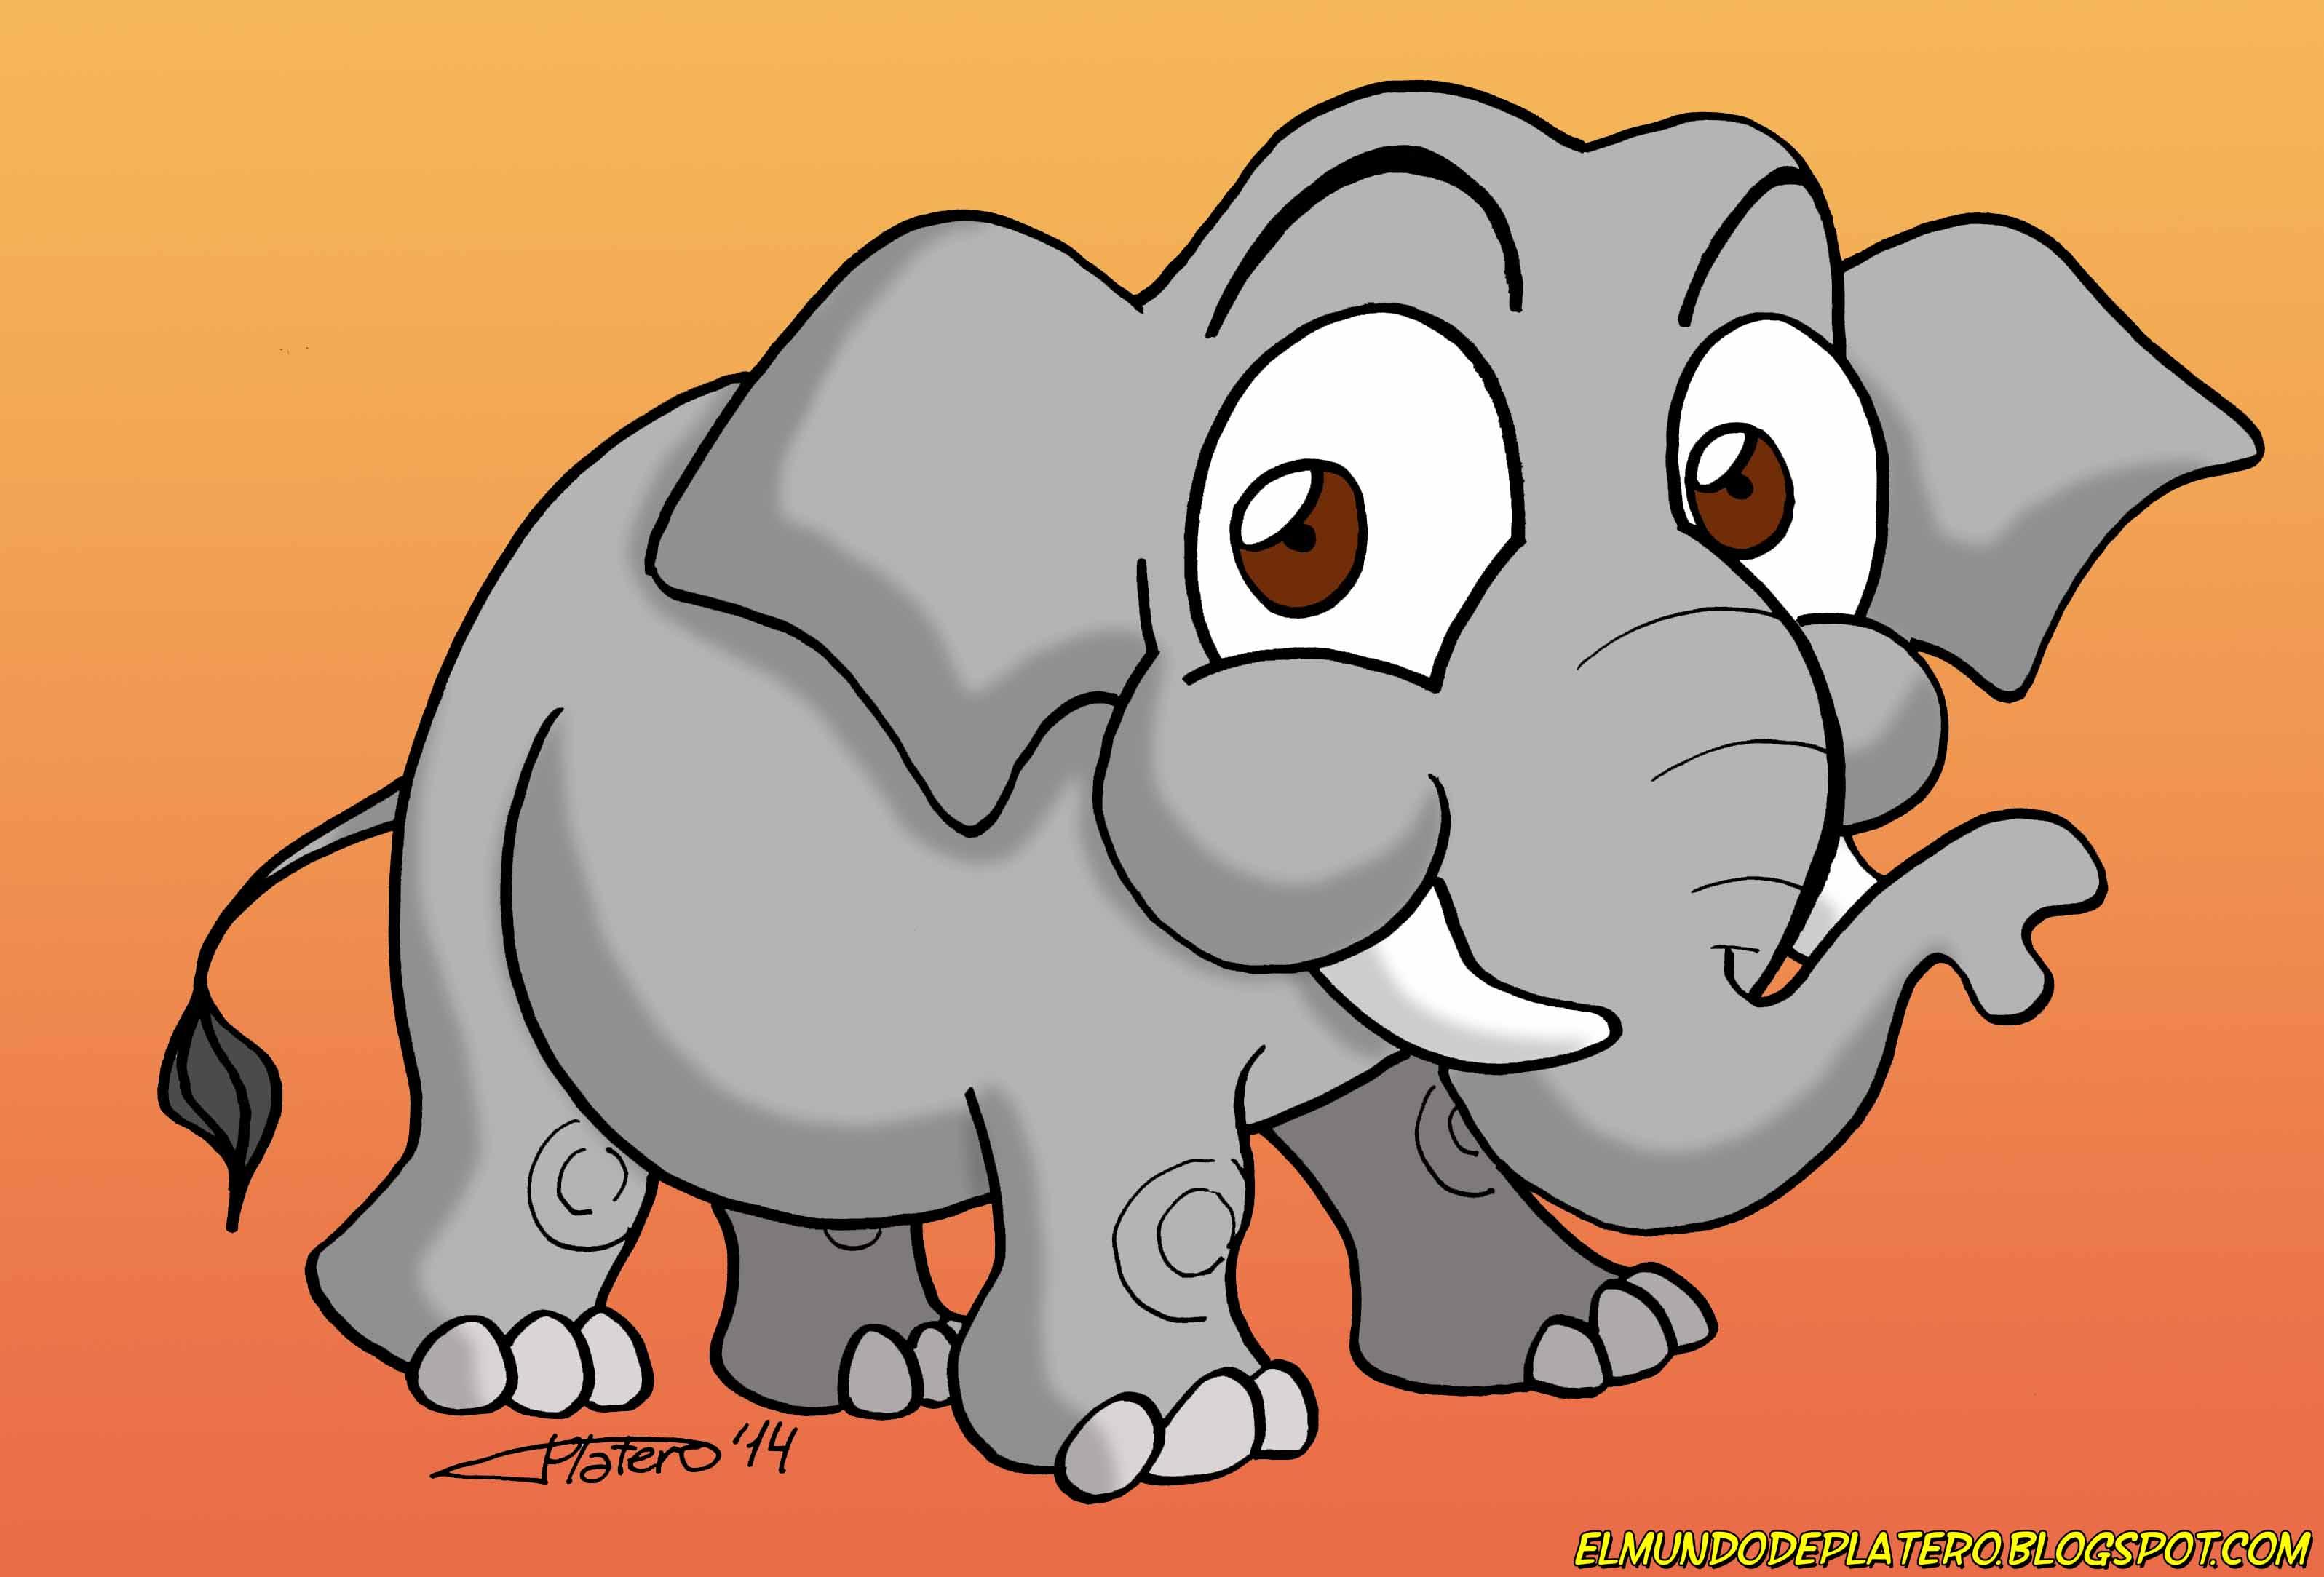 ilustraciones_infantiles_elefante_dibujos_infantiles_por_encargo_elmundodeplater